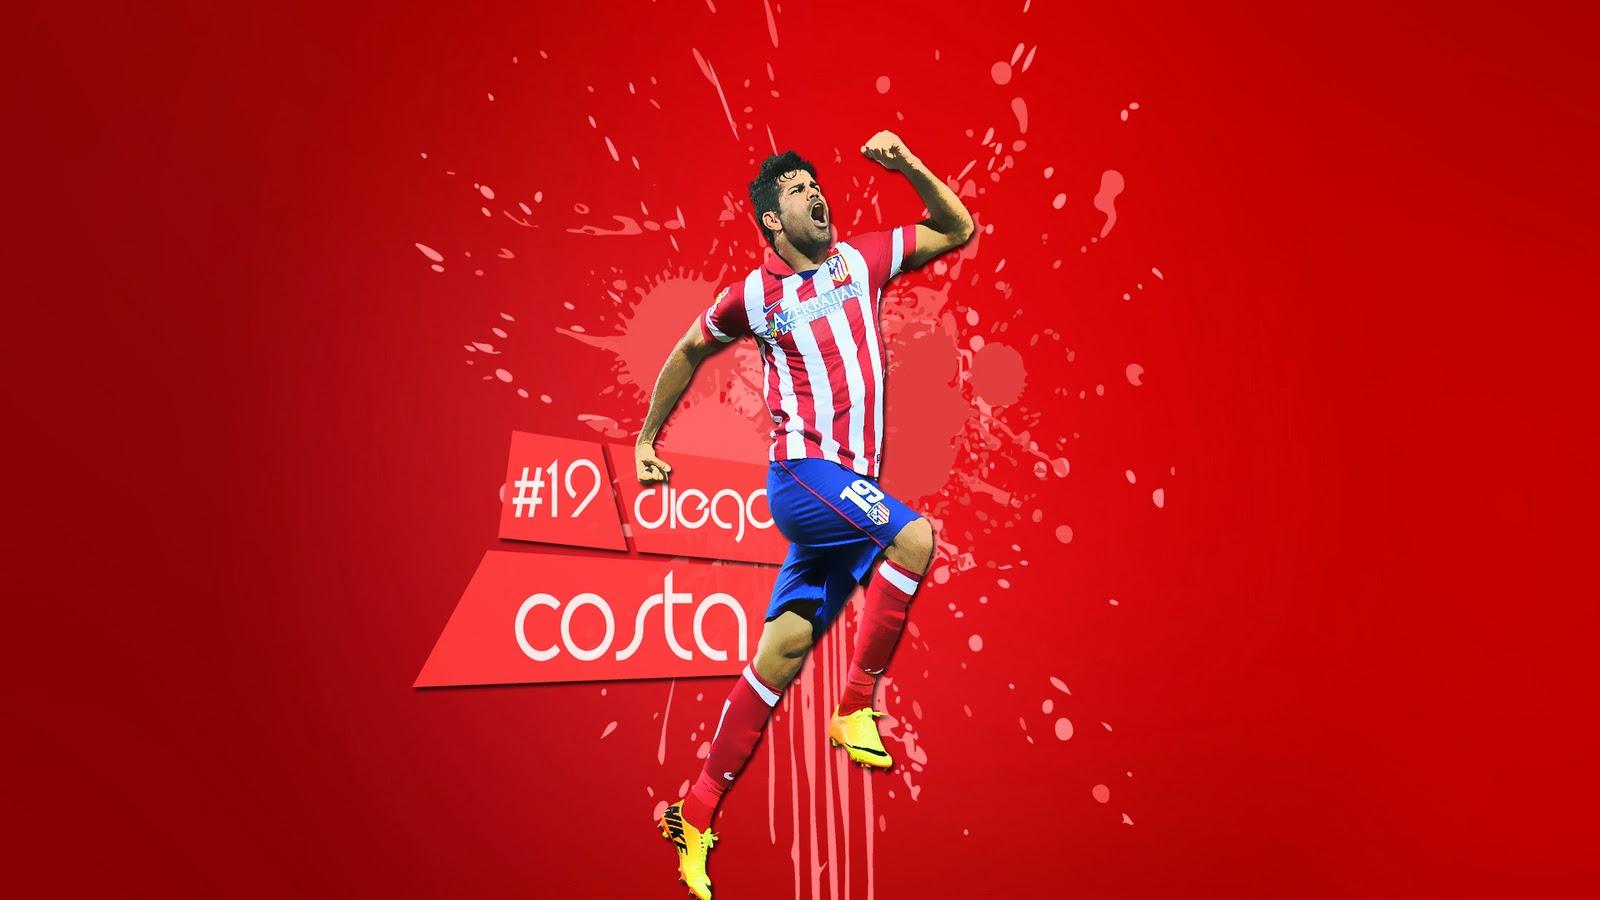 Atletico Madrid FC Wallpaper HQ 38 1239 Wallpaper Cool Wallpaper 1600x900